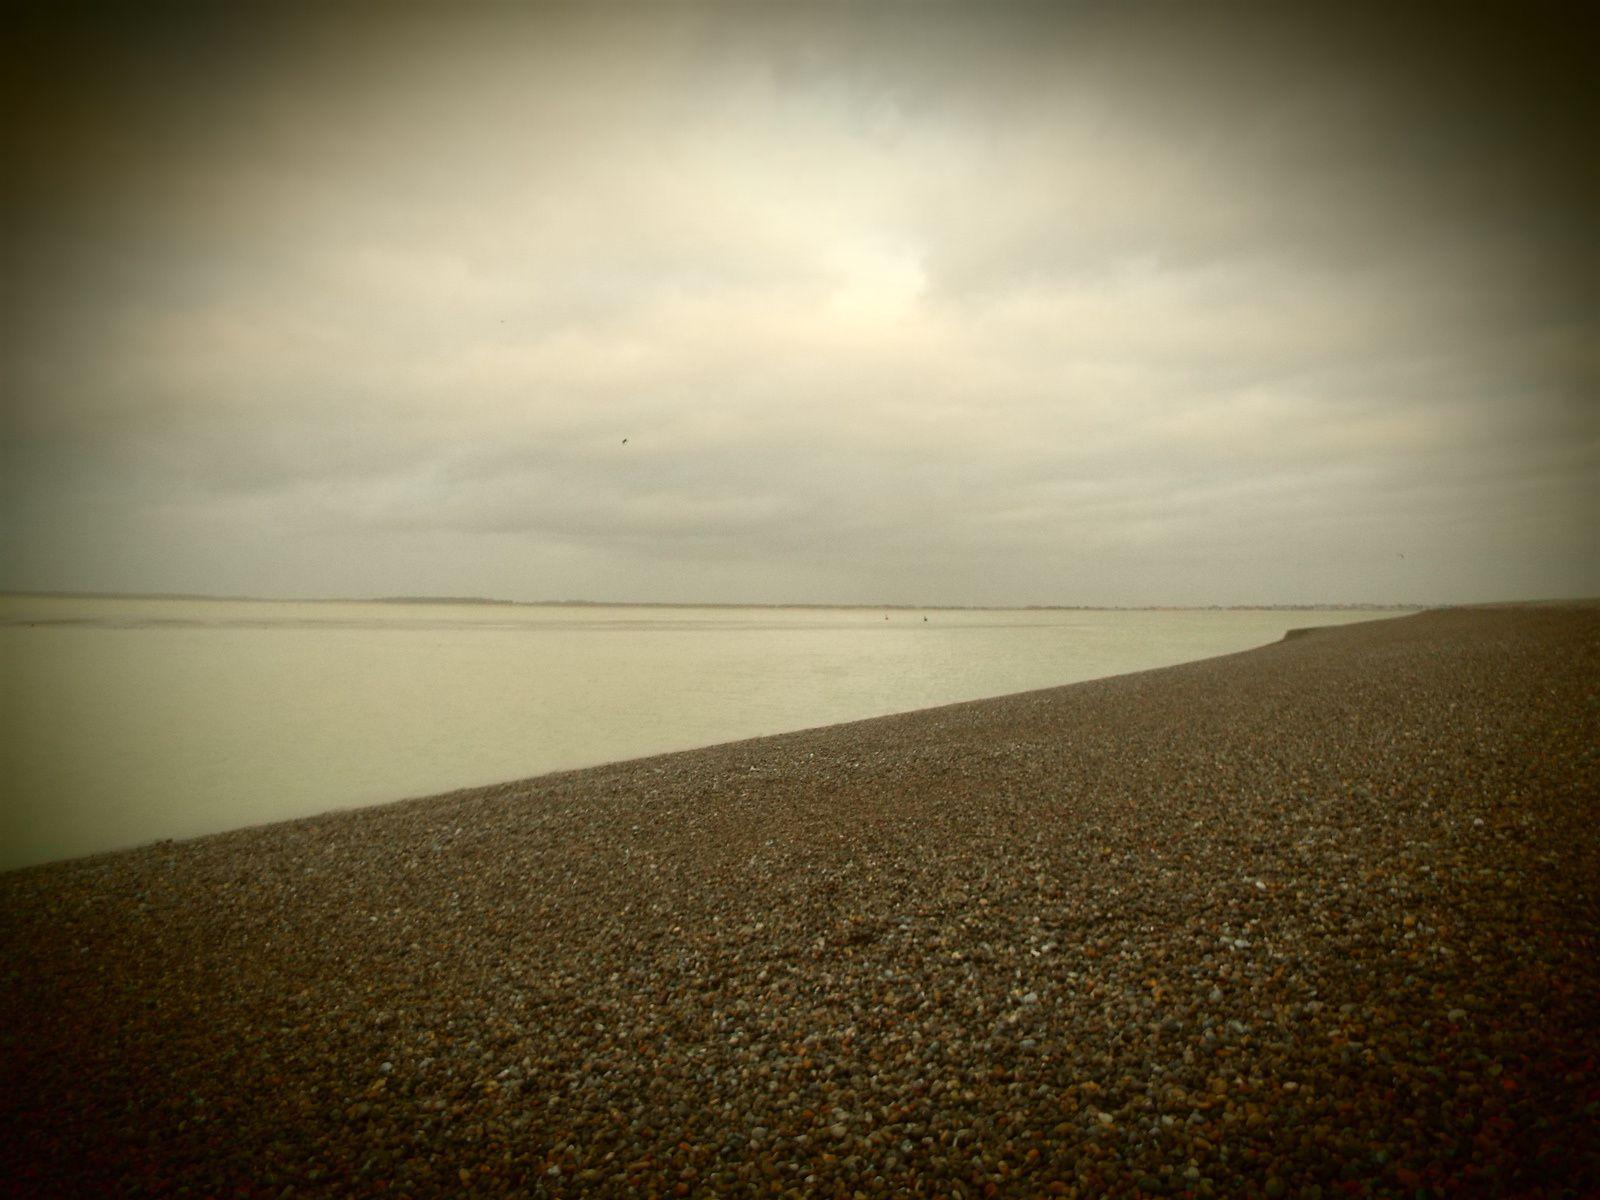 Promenade en baie de Somme.